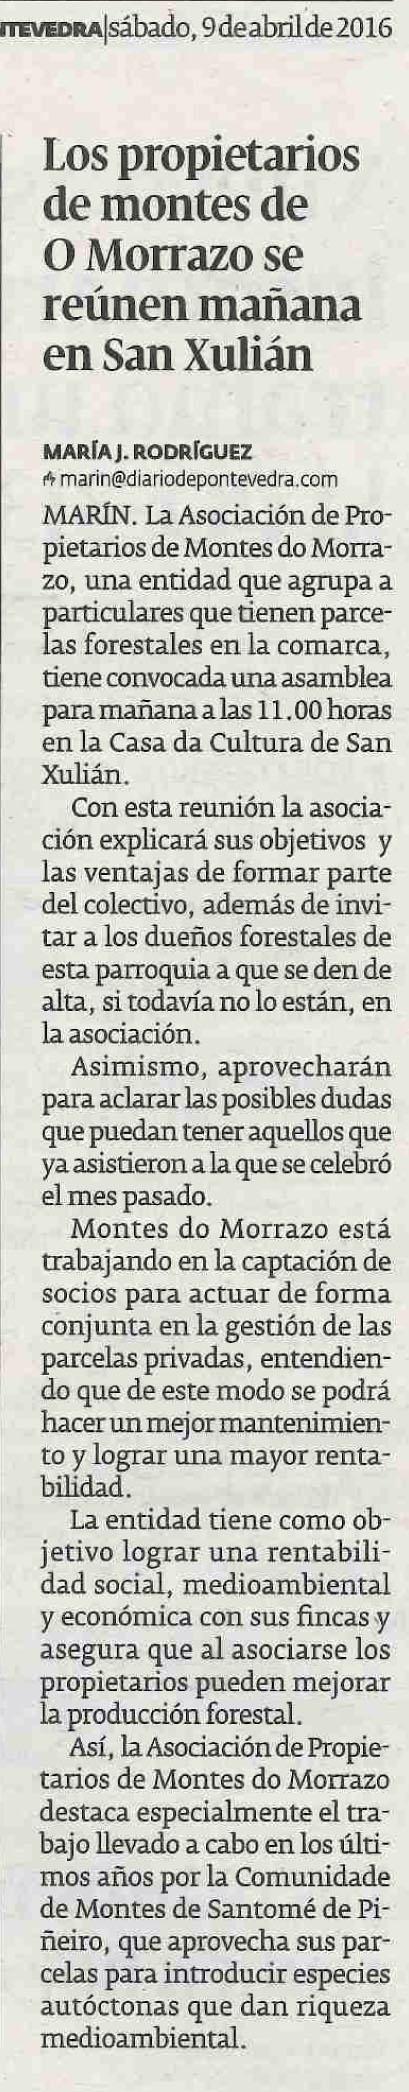 Diario, 9 abril 2016